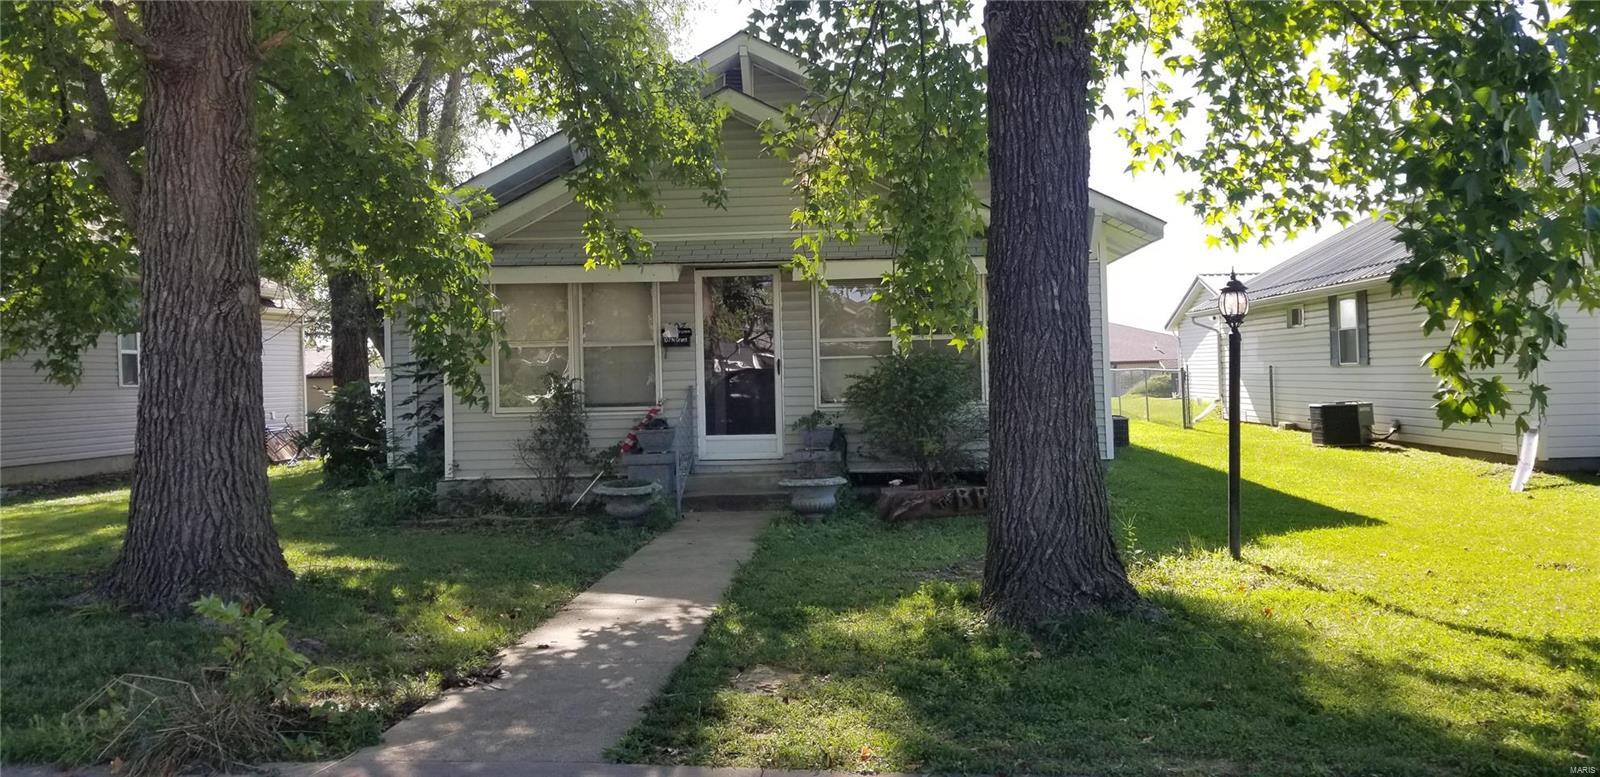 107 N Grant Property Photo